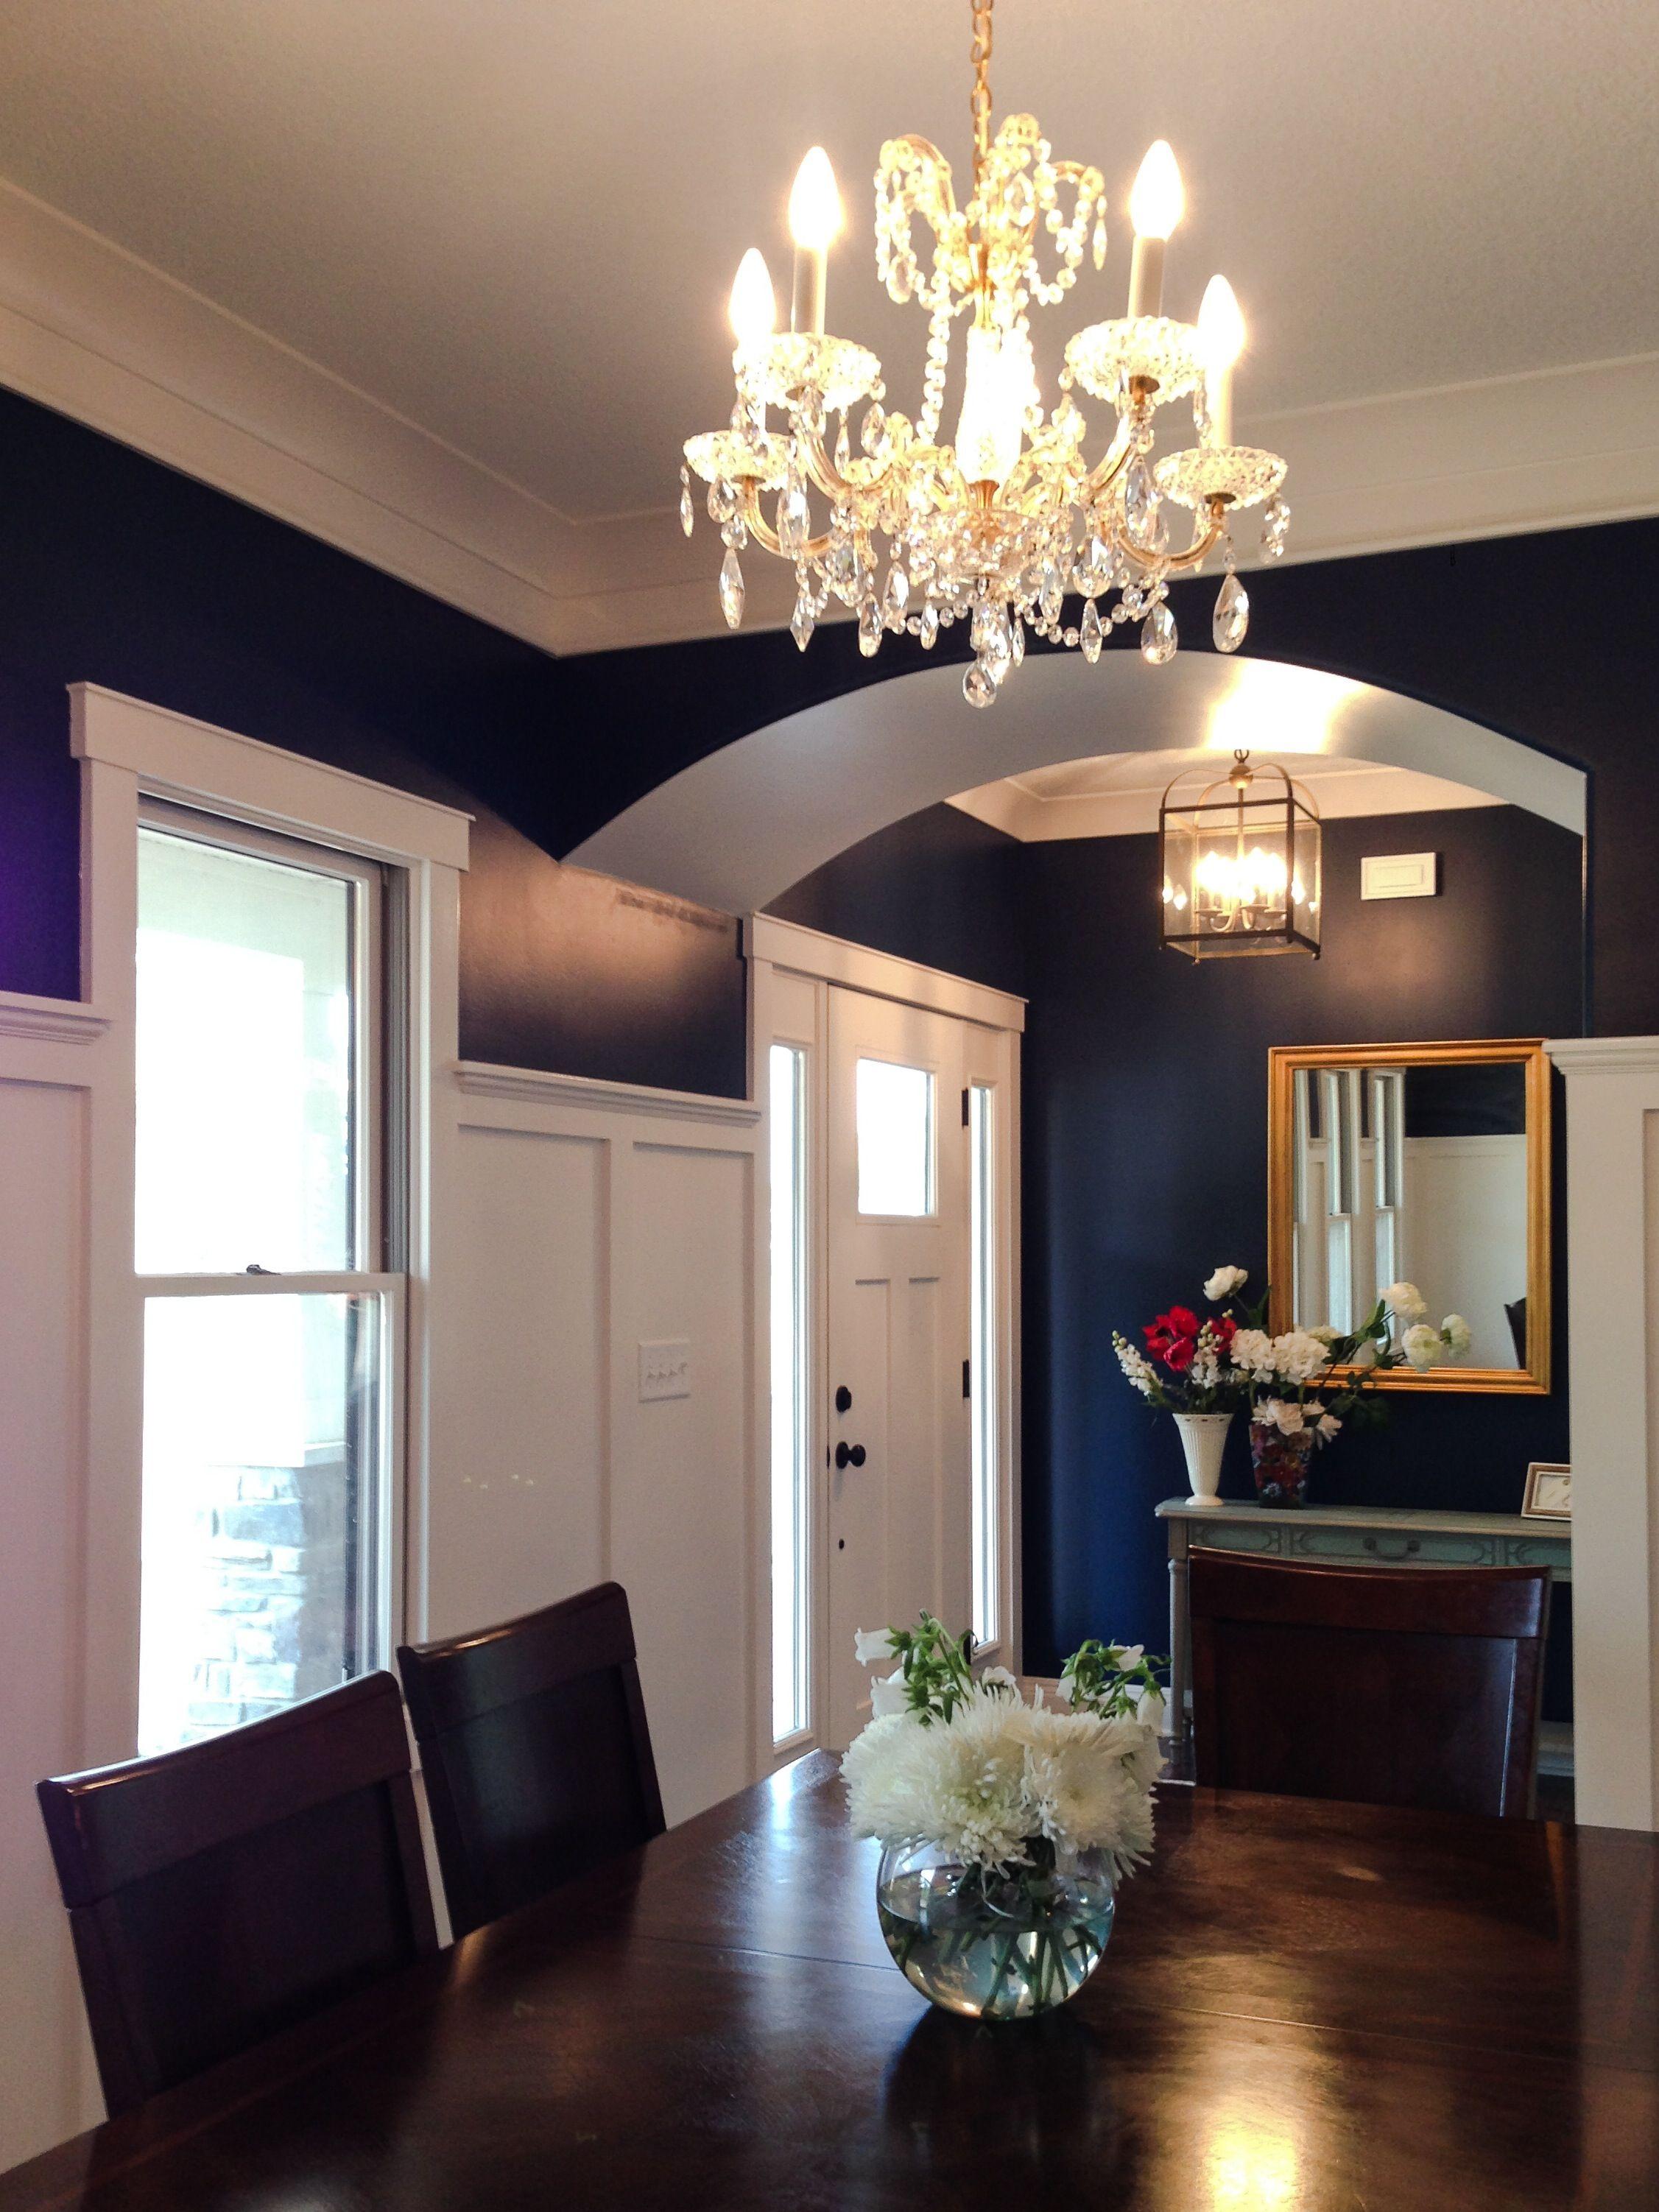 Indigo Streamer And Woodlawn Bedroom White Vintage Chandelier Foyer Light Overstock